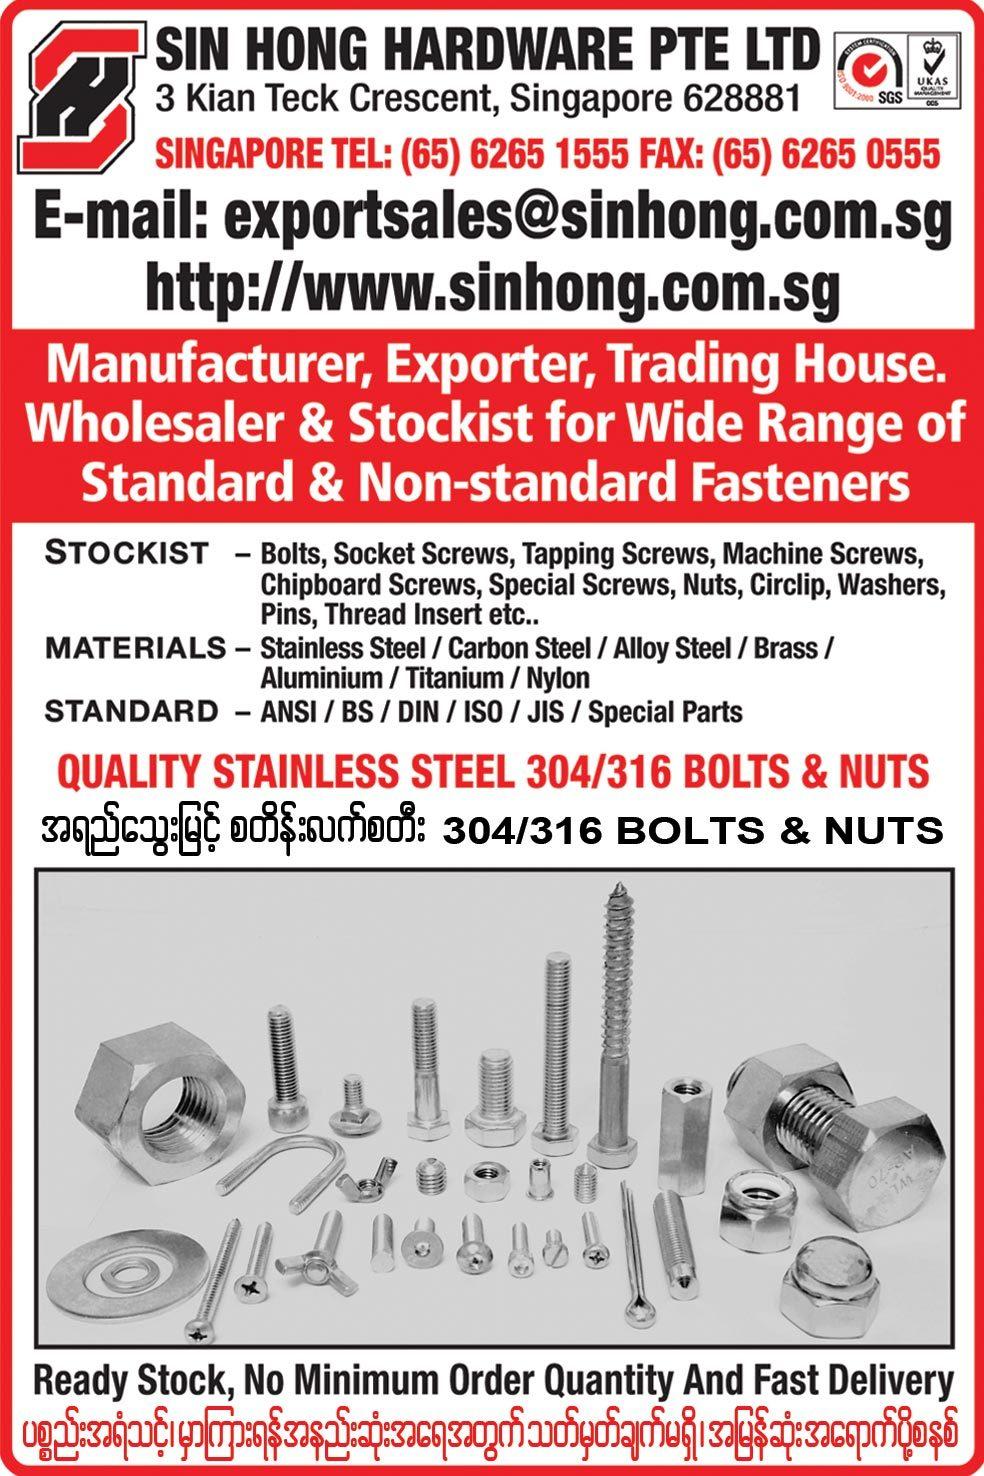 Sin-Hong-Hardware-Pte-Ltd_Bolts-&-Nuts_3940.jpg